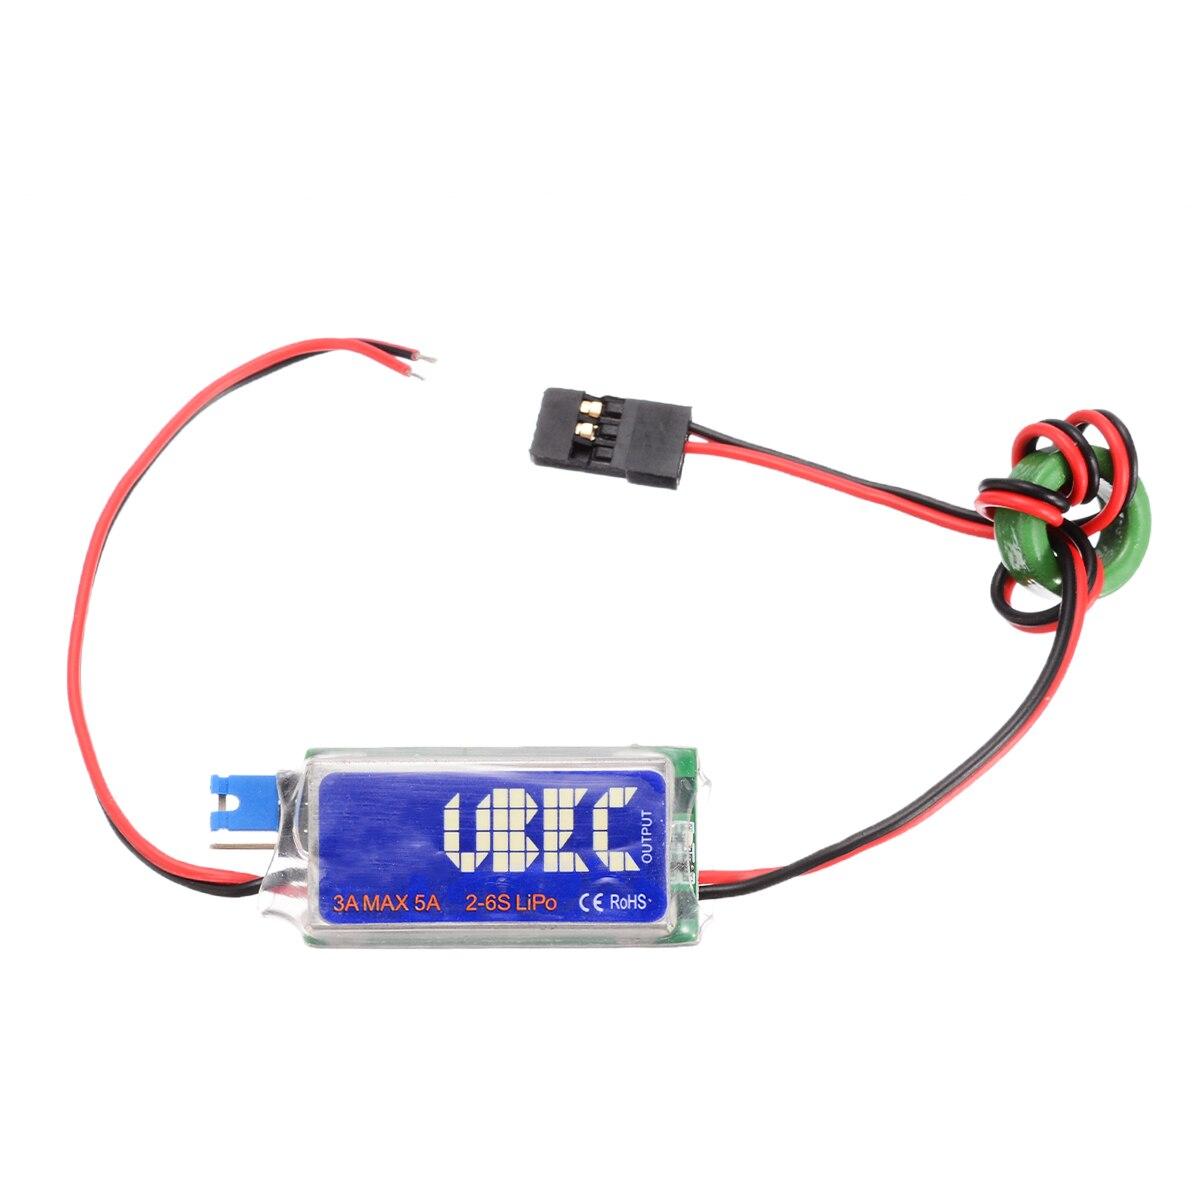 RC UBEC 5V 6V 3A Max 5A Switch Mode Lowest RF Noise BEC Kit for RC Models #*